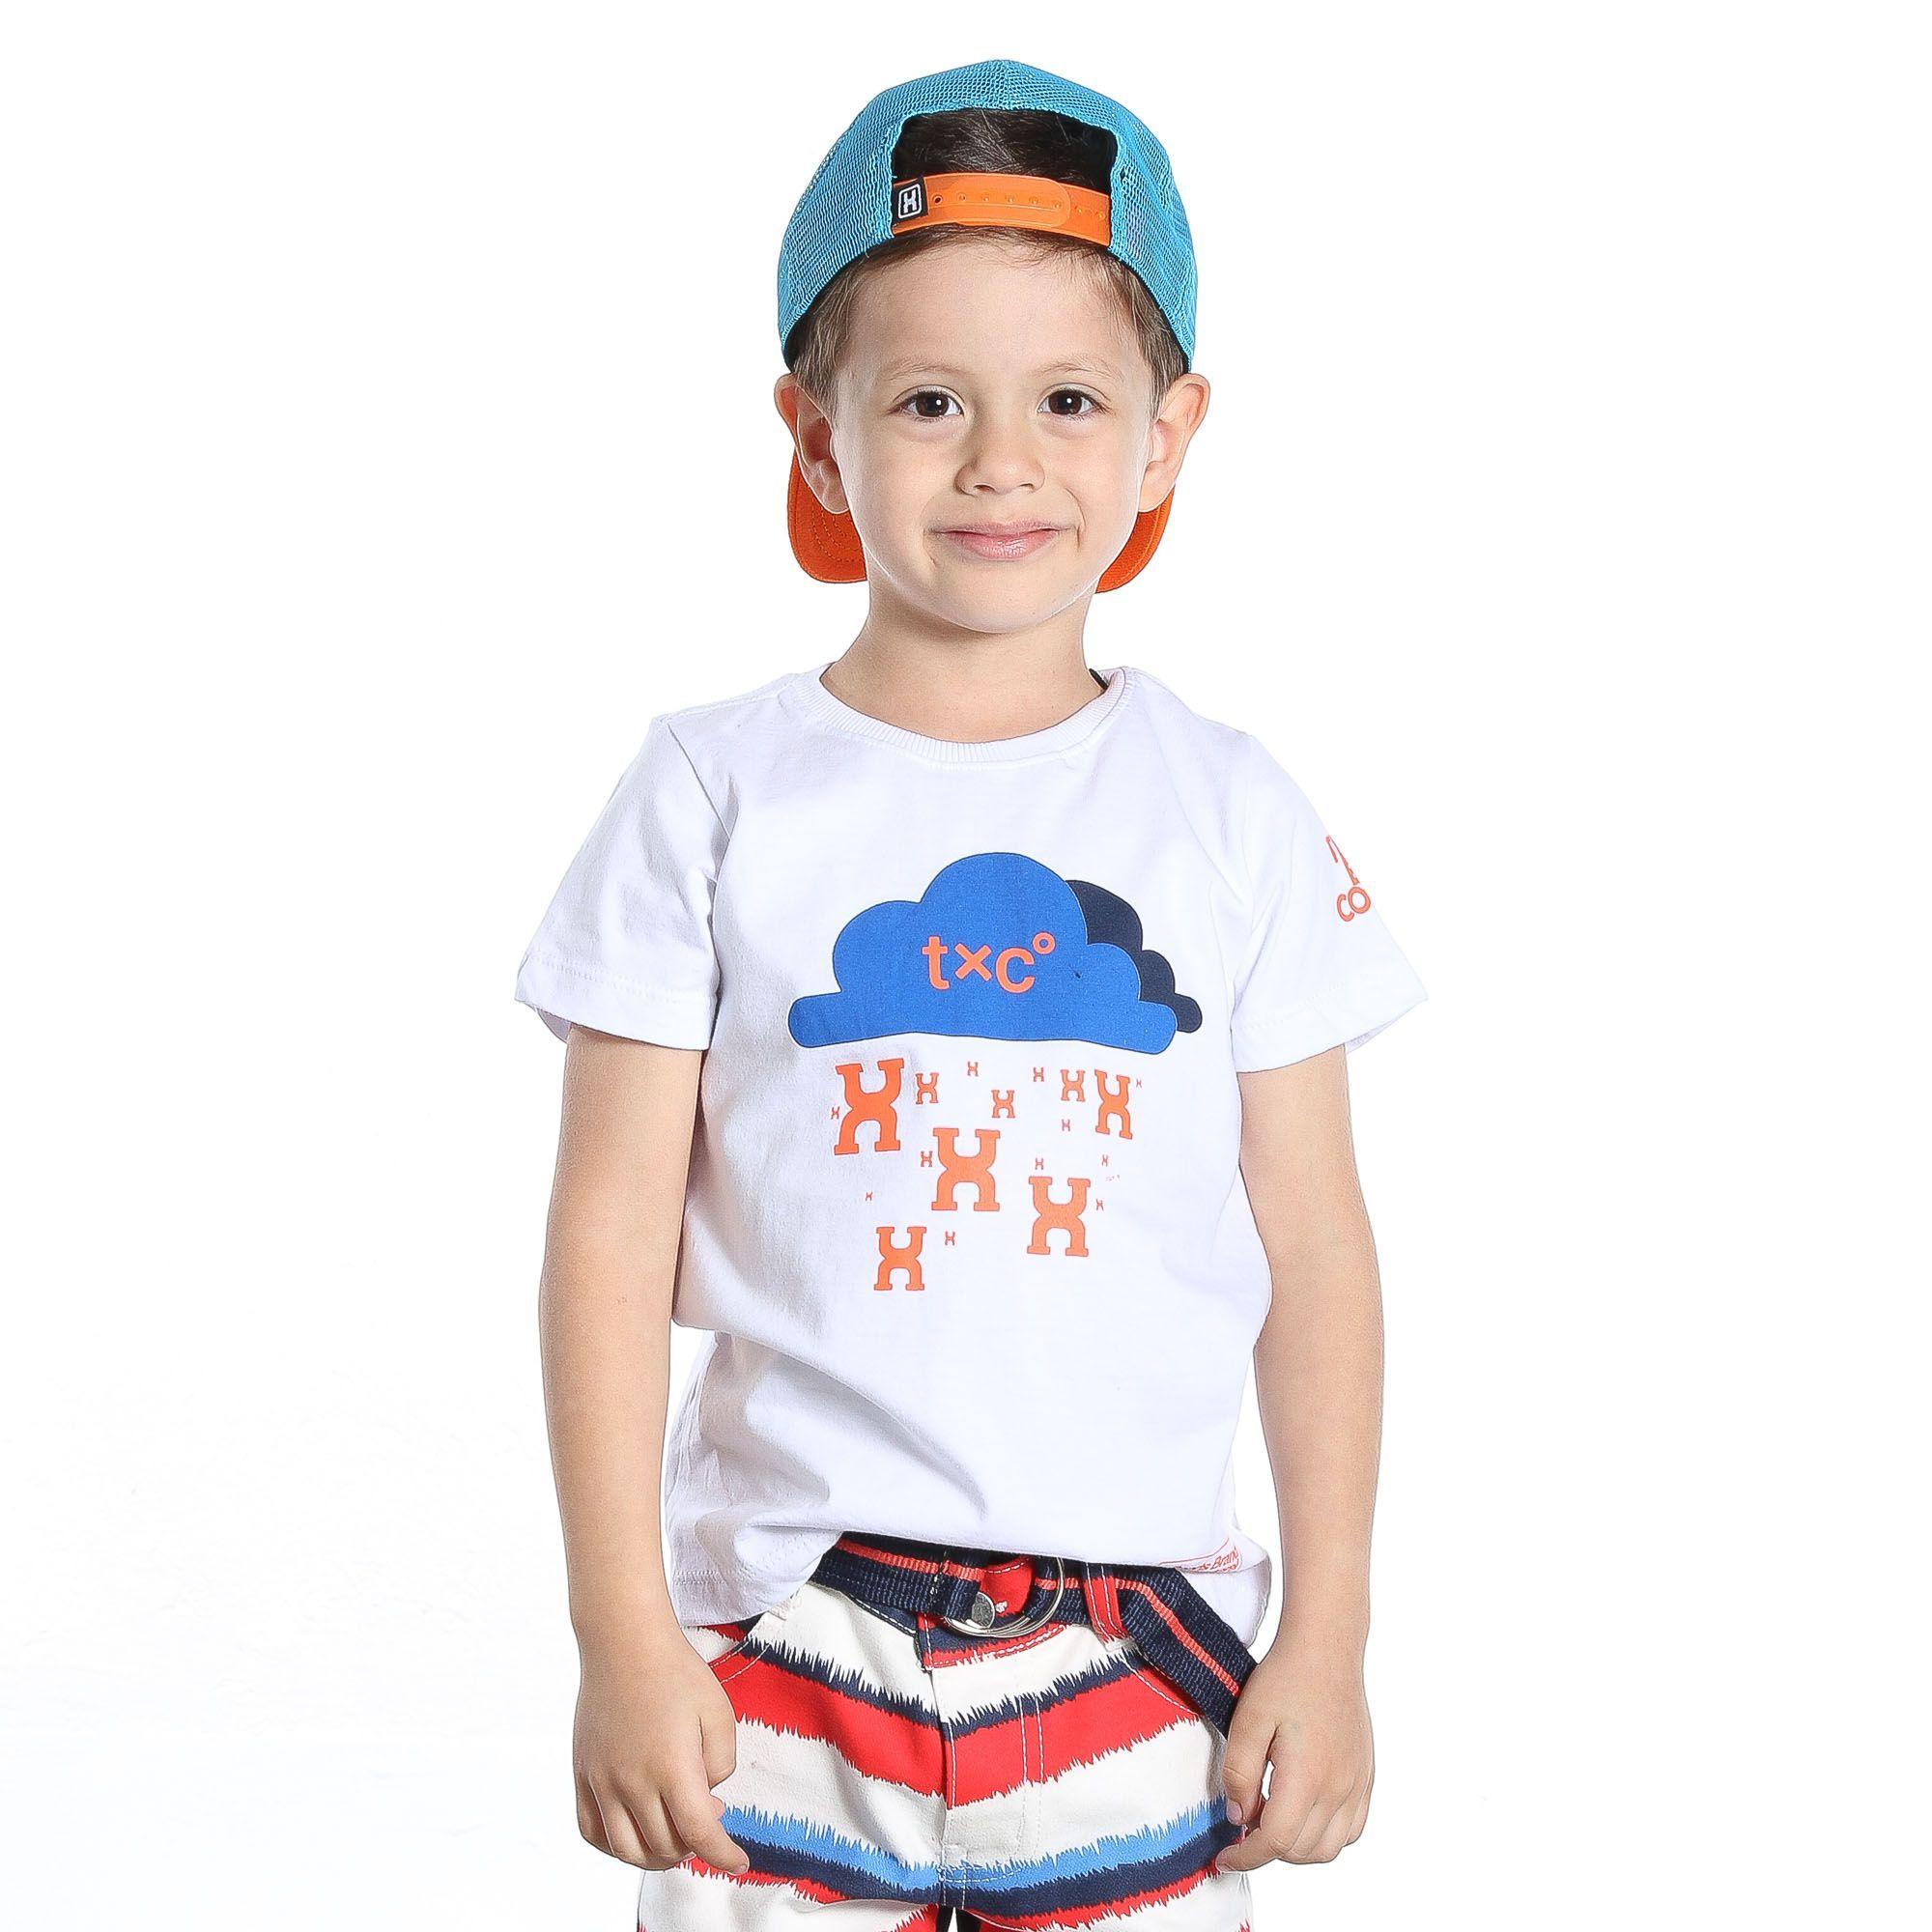 Camiseta infantil TXC 14041I